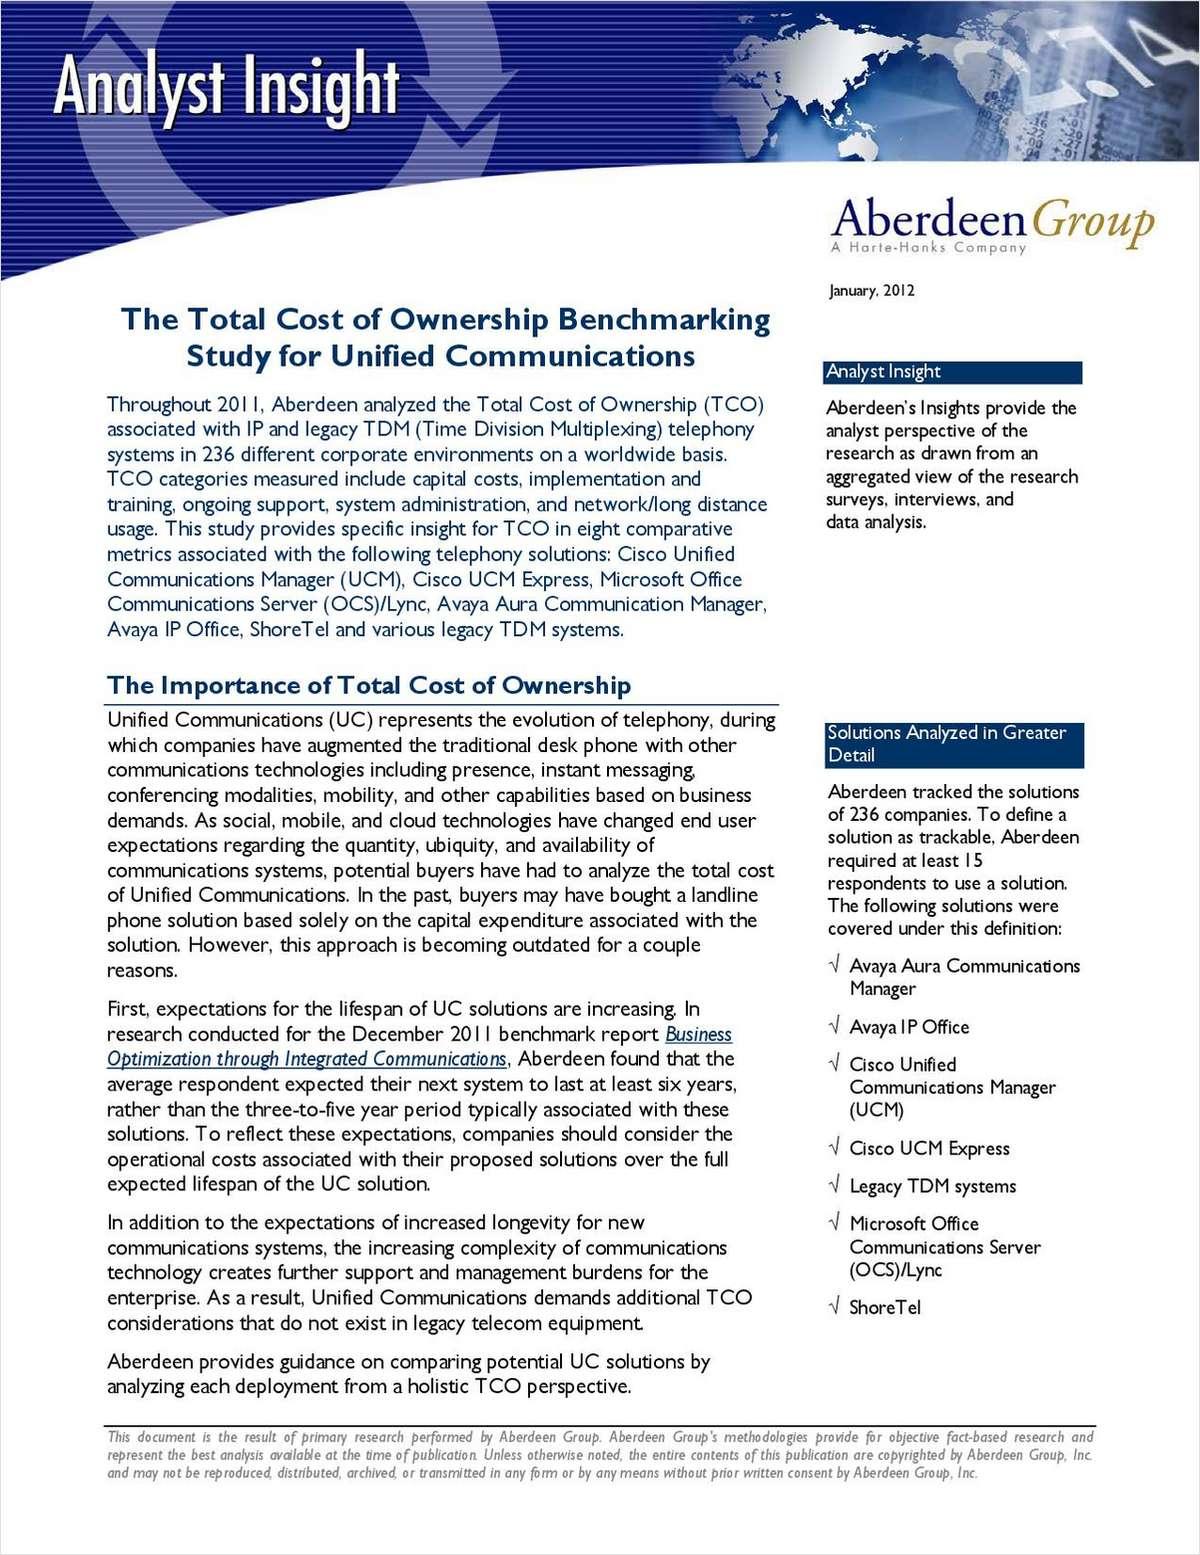 Aberdeen TCO Benchmarking Study